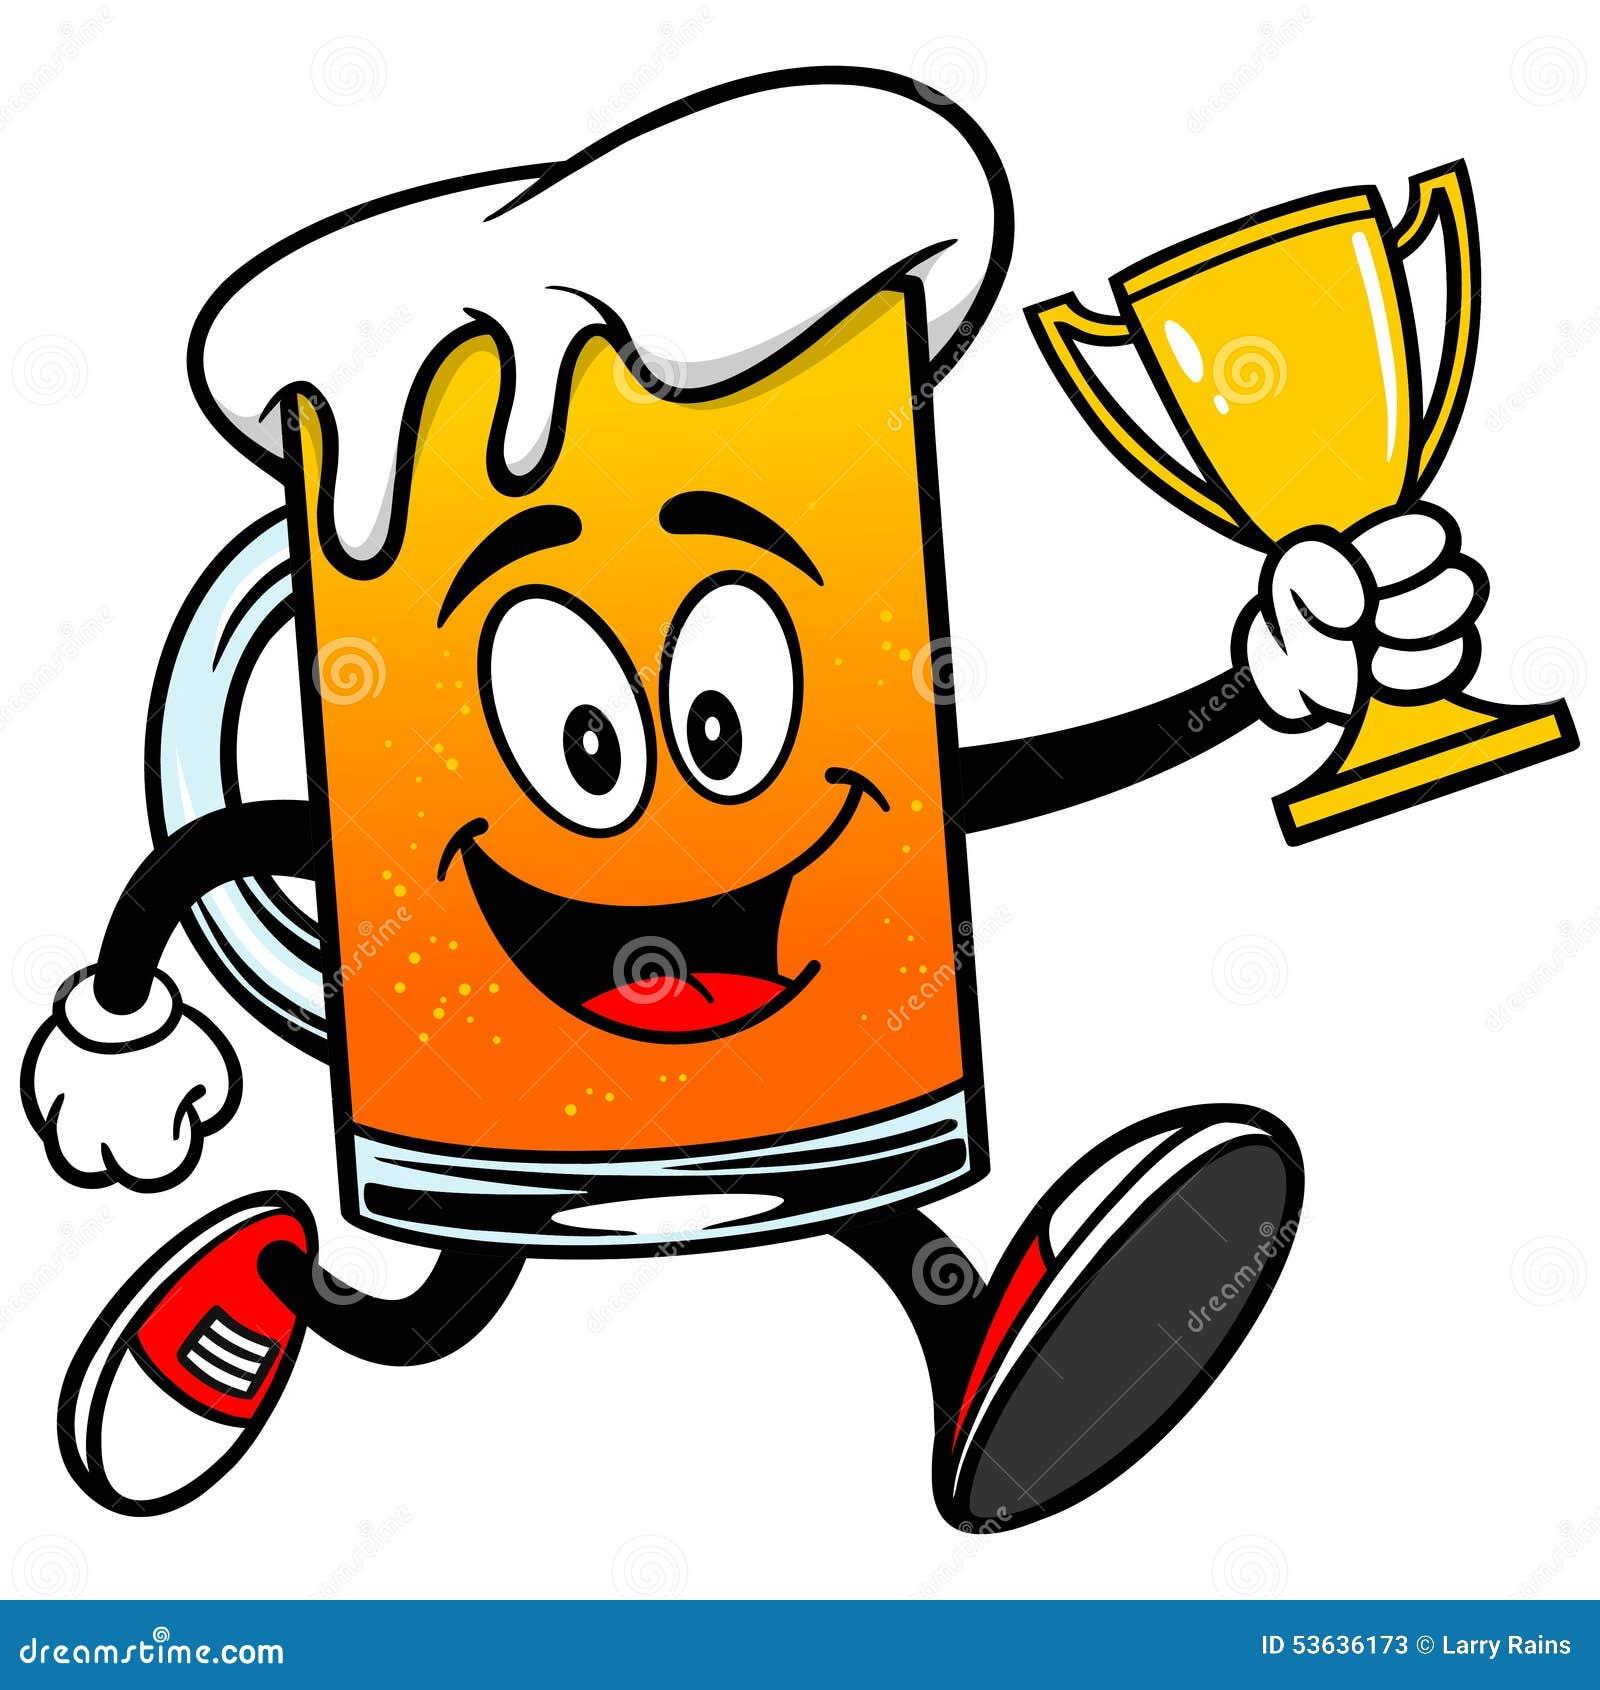 Award Winning Wine Label Design Wine Label Design